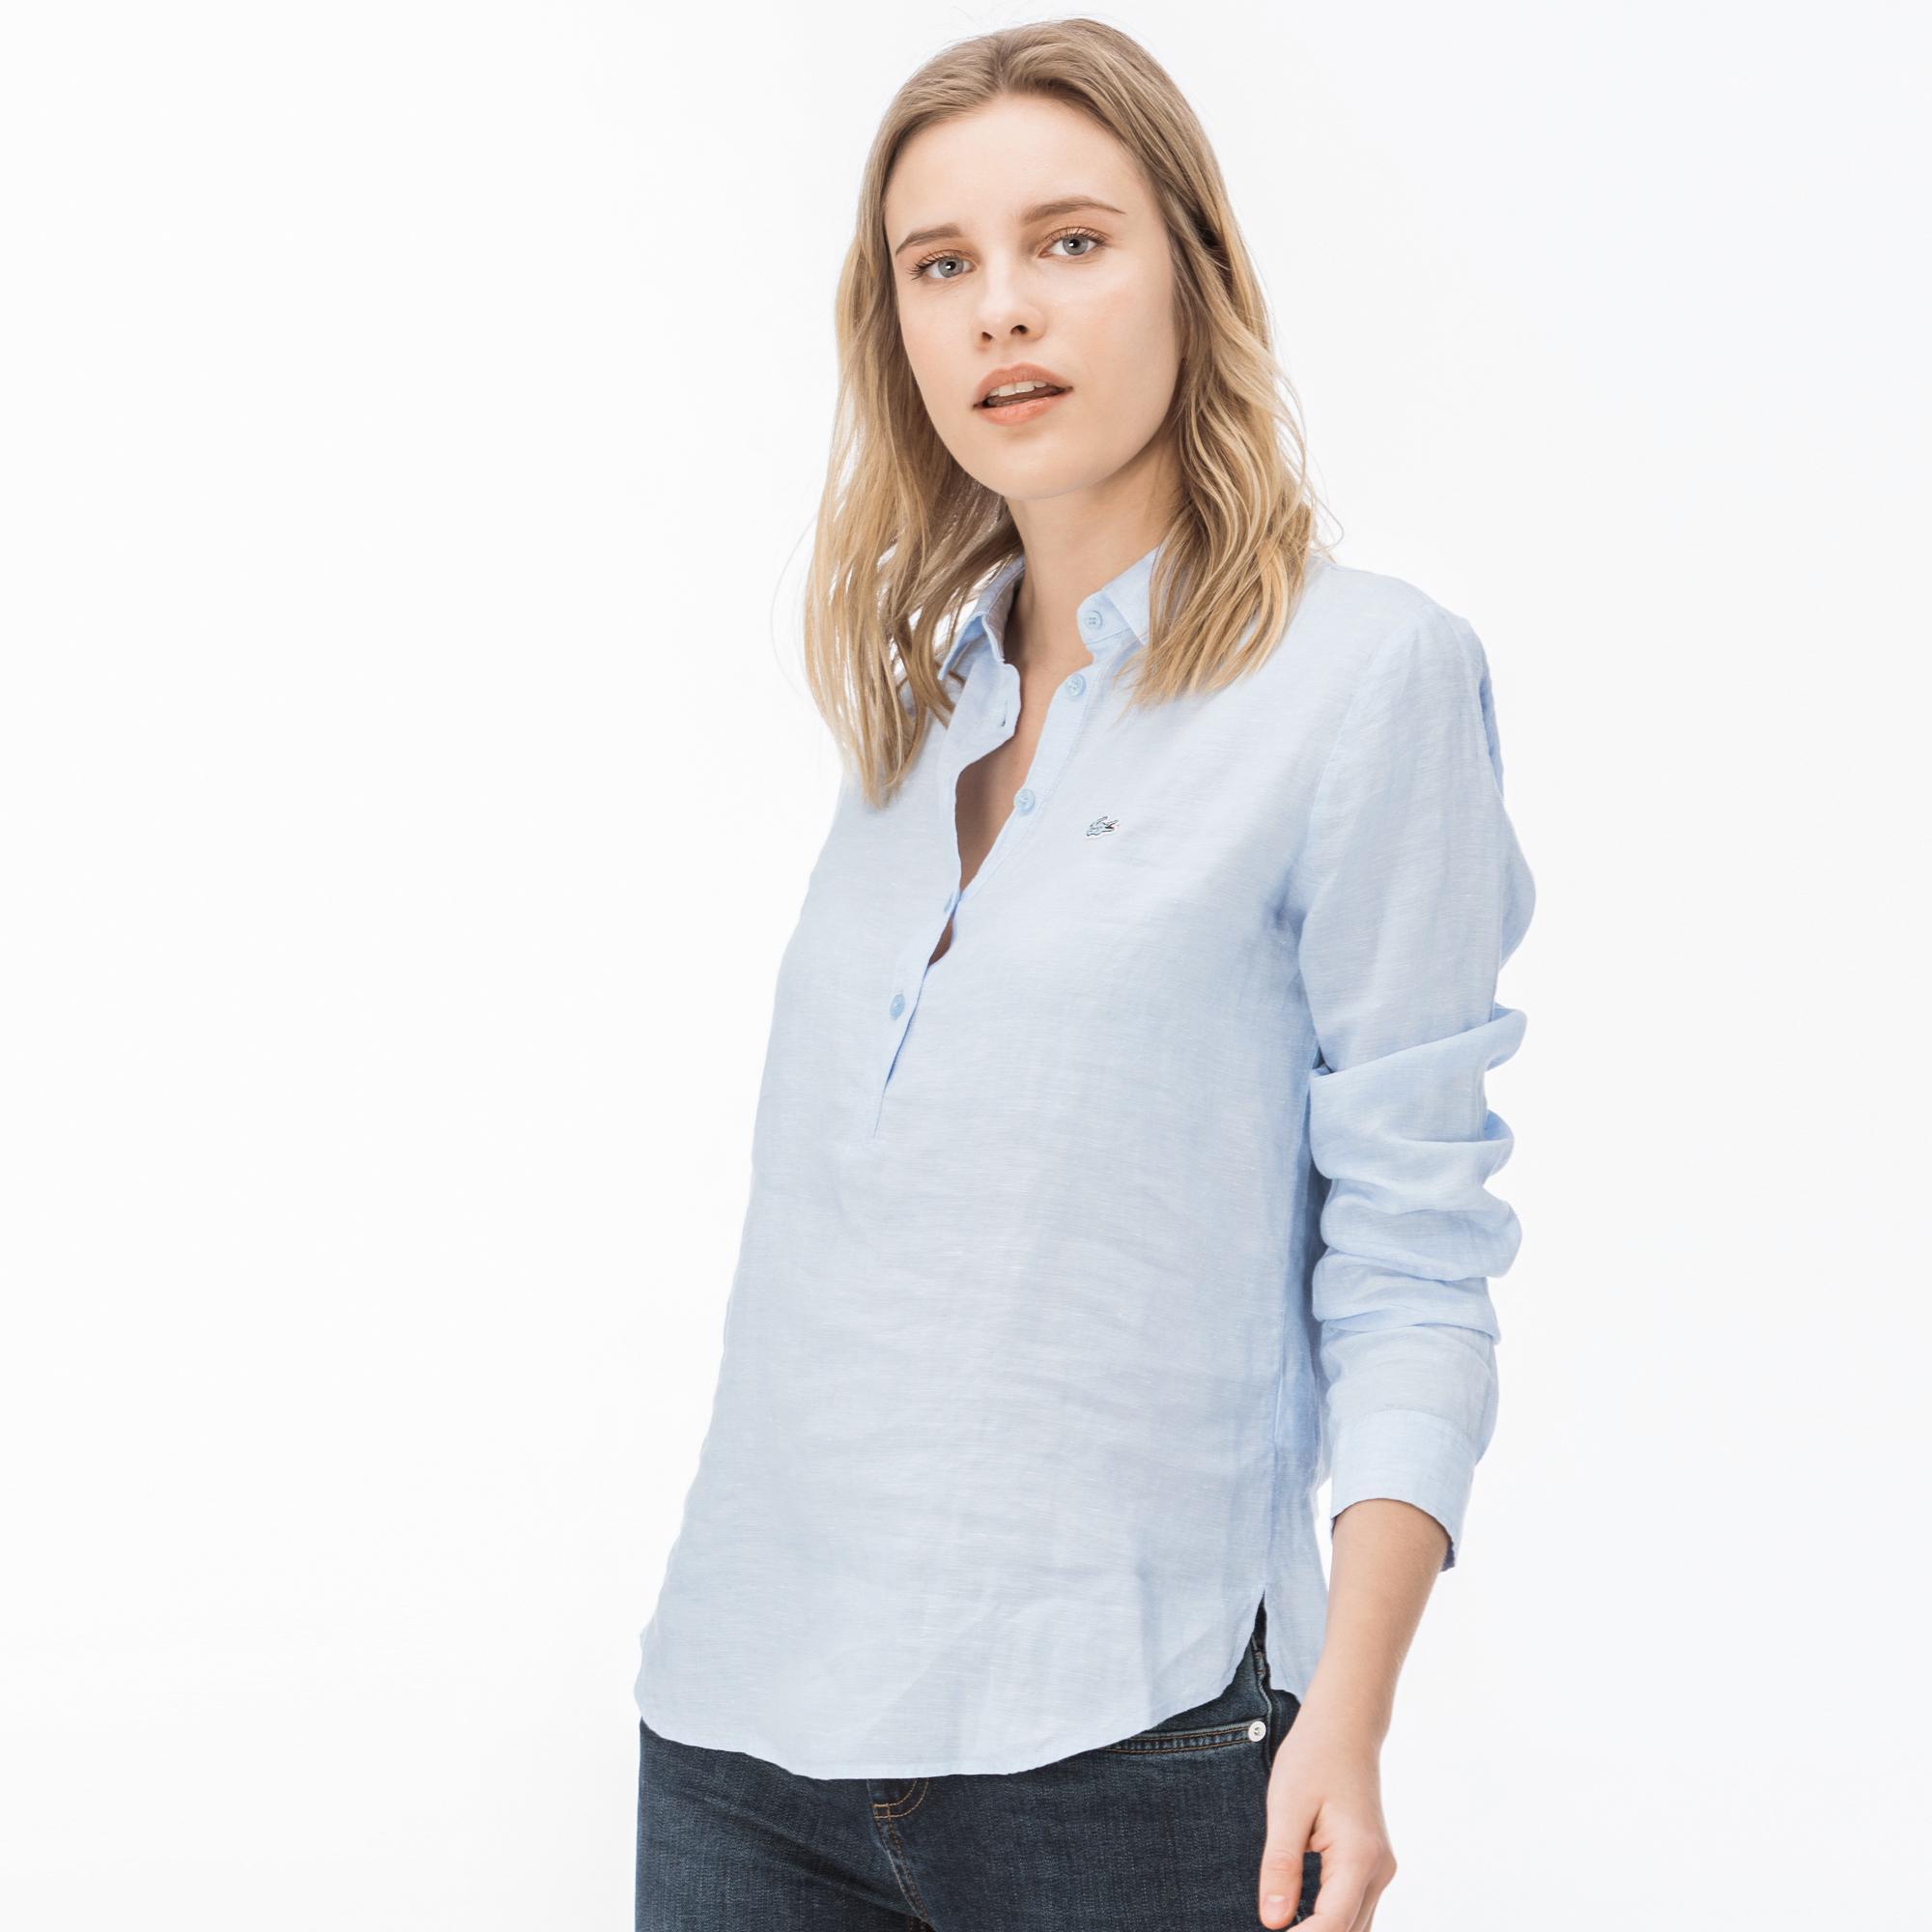 Lacoste Women's Shirts